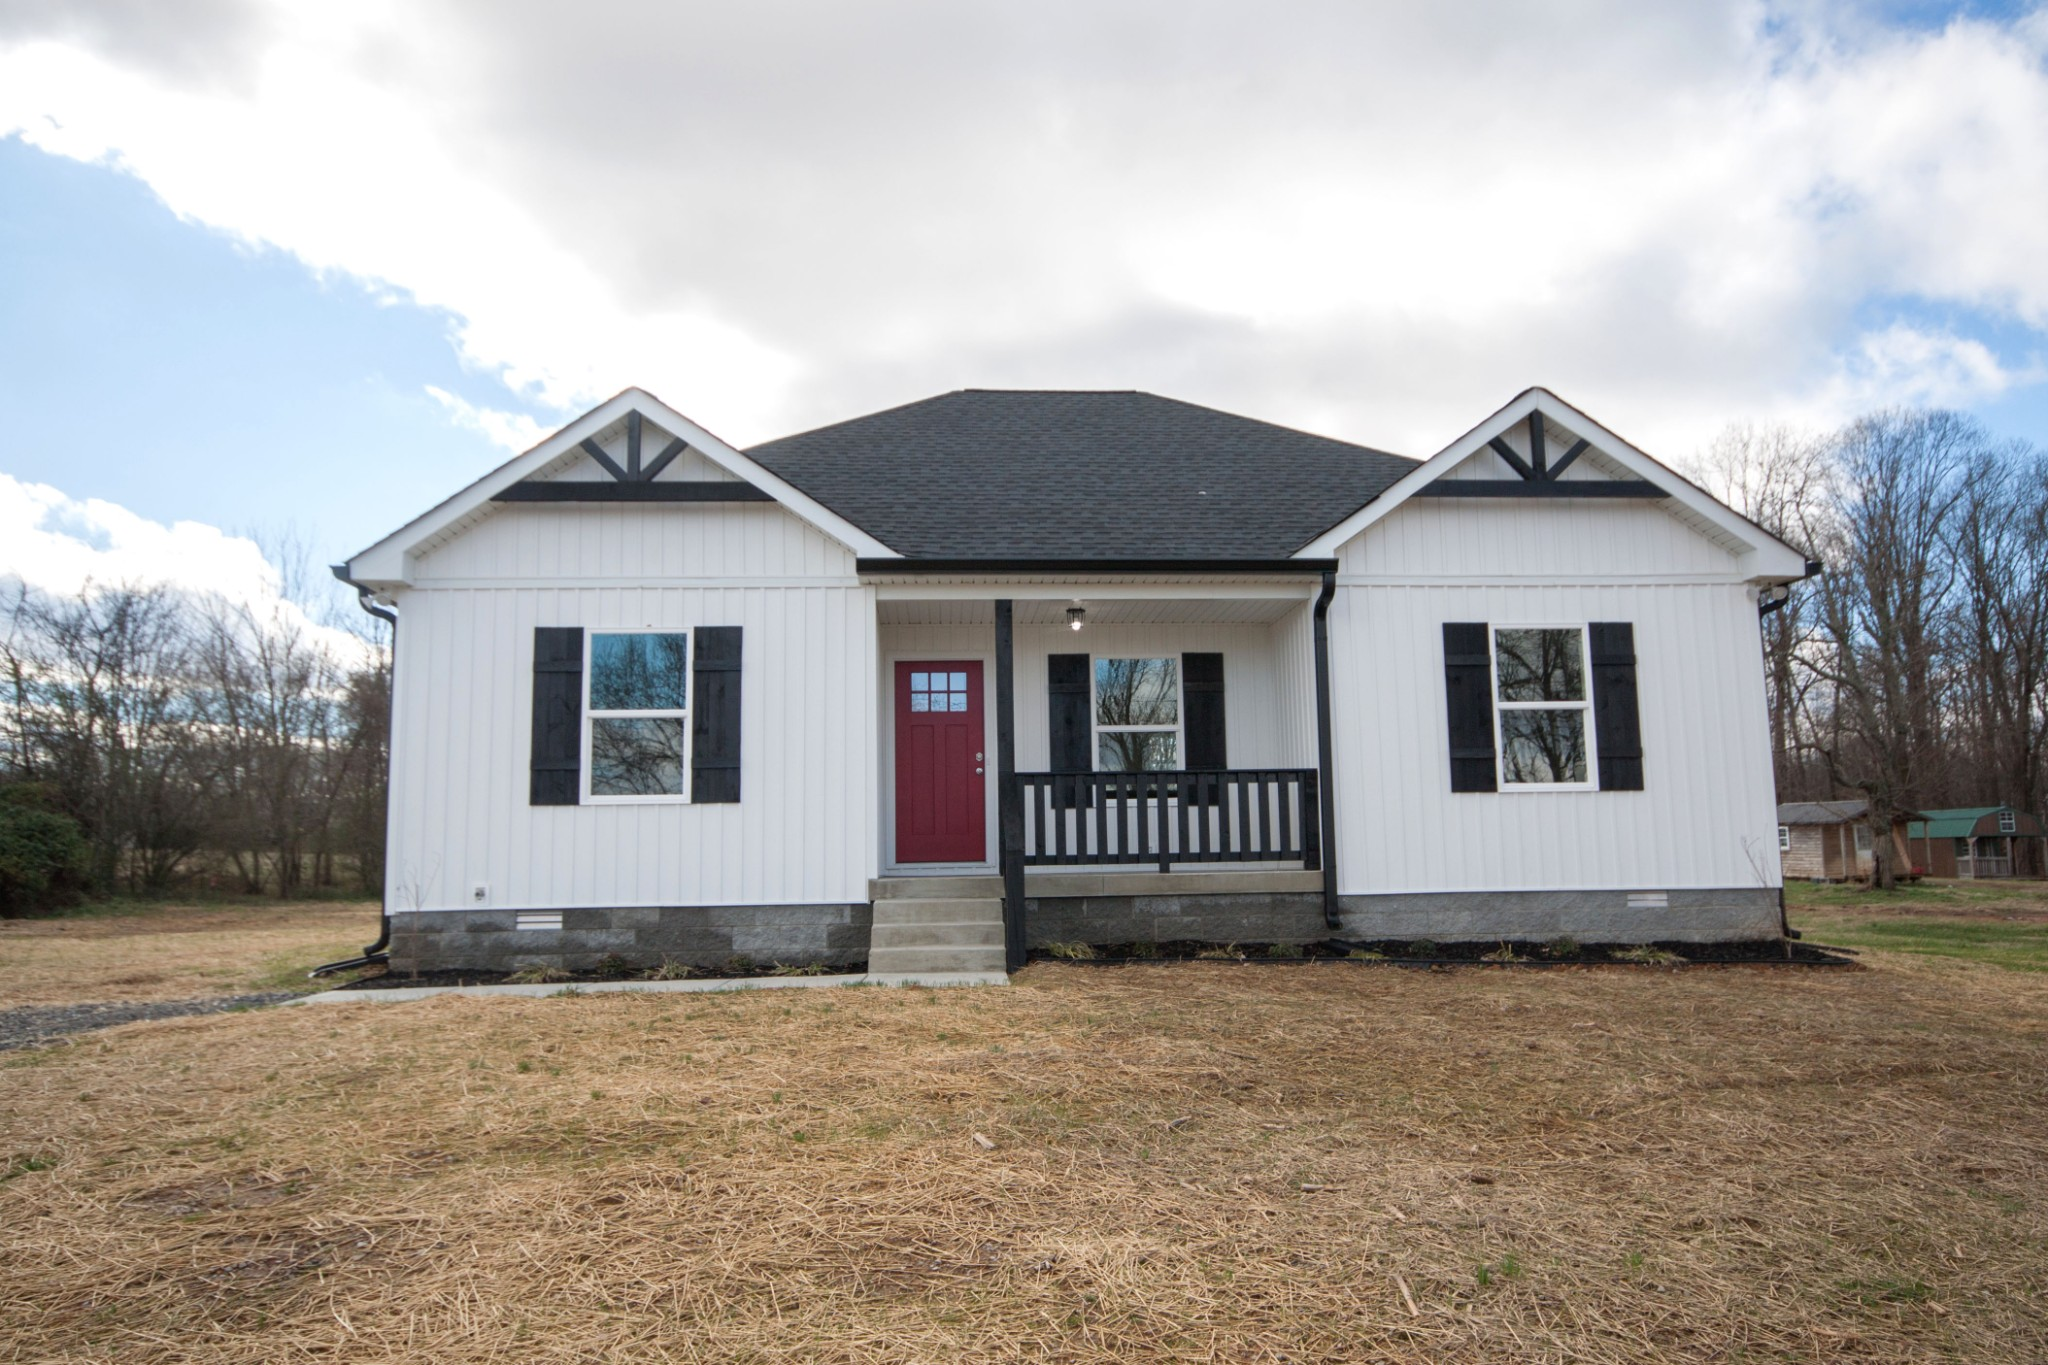 8513 Hwy 25 E, Cross Plains, TN 37049 - Cross Plains, TN real estate listing